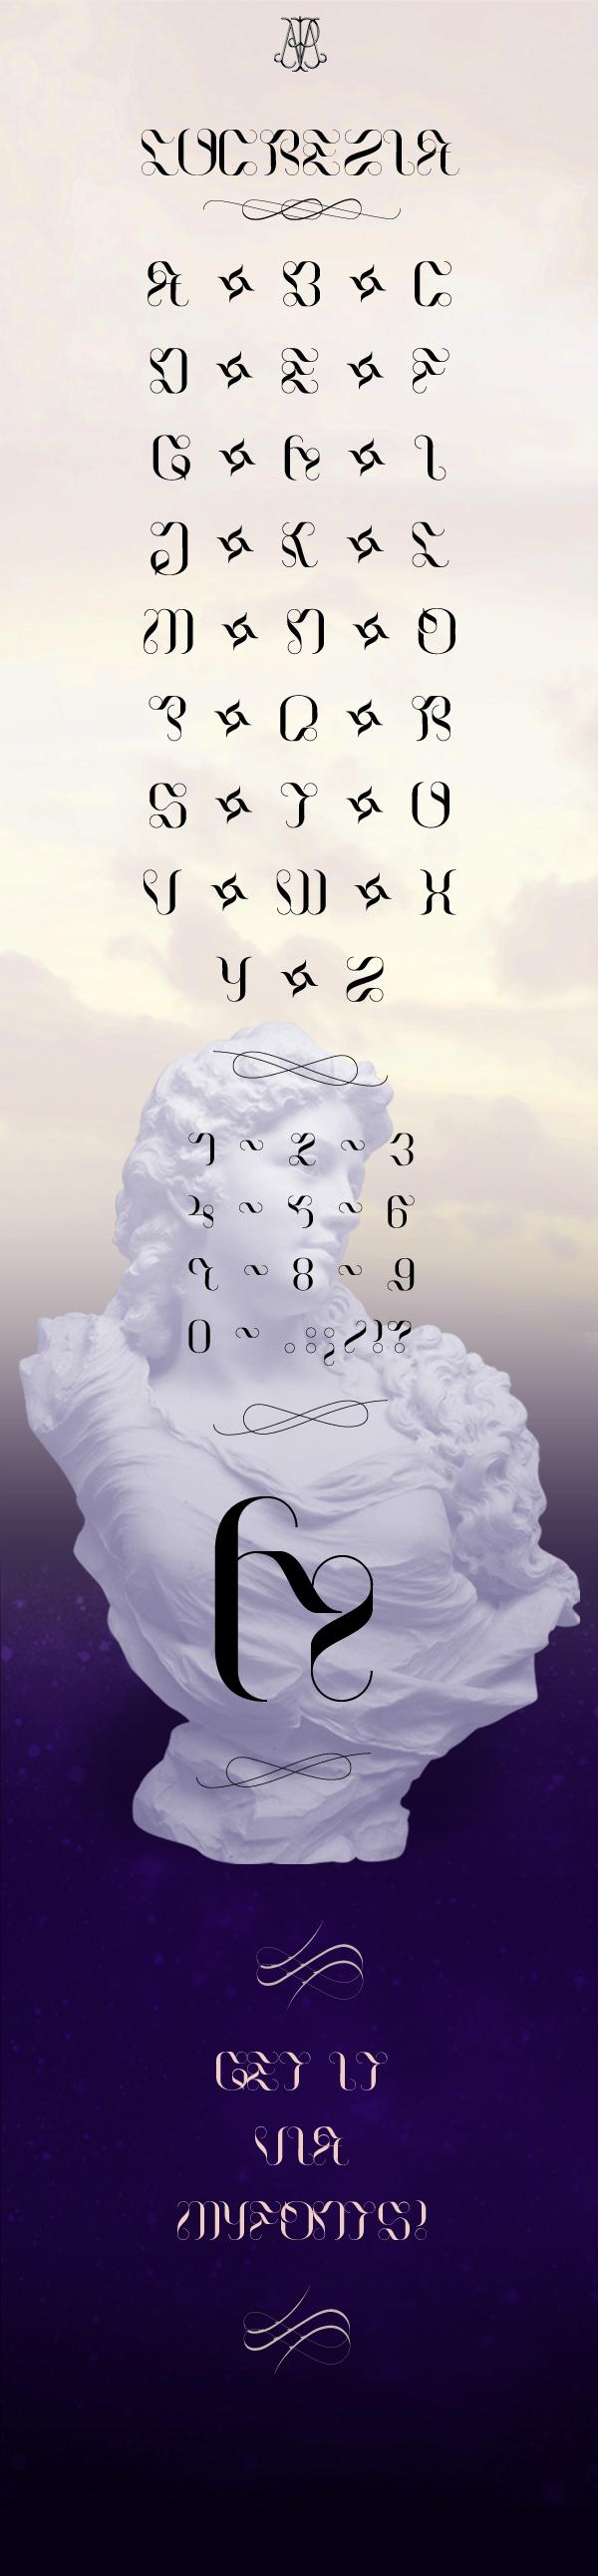 Lucrezia-fresh-free-fonts-2012